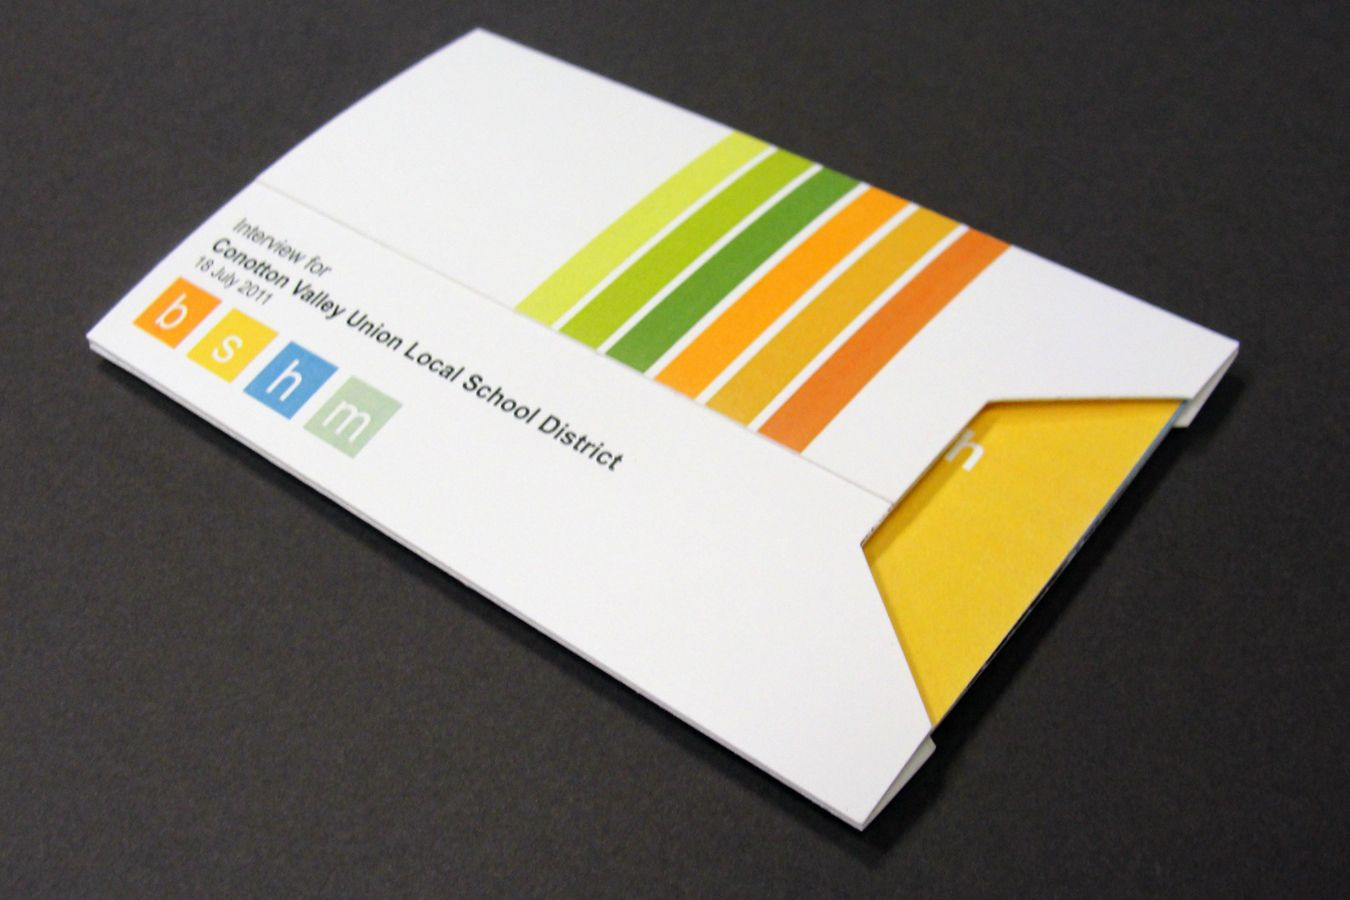 Interview leave behind rachel j crafton business cards business cards interview leave behind rachel j crafton colourmoves